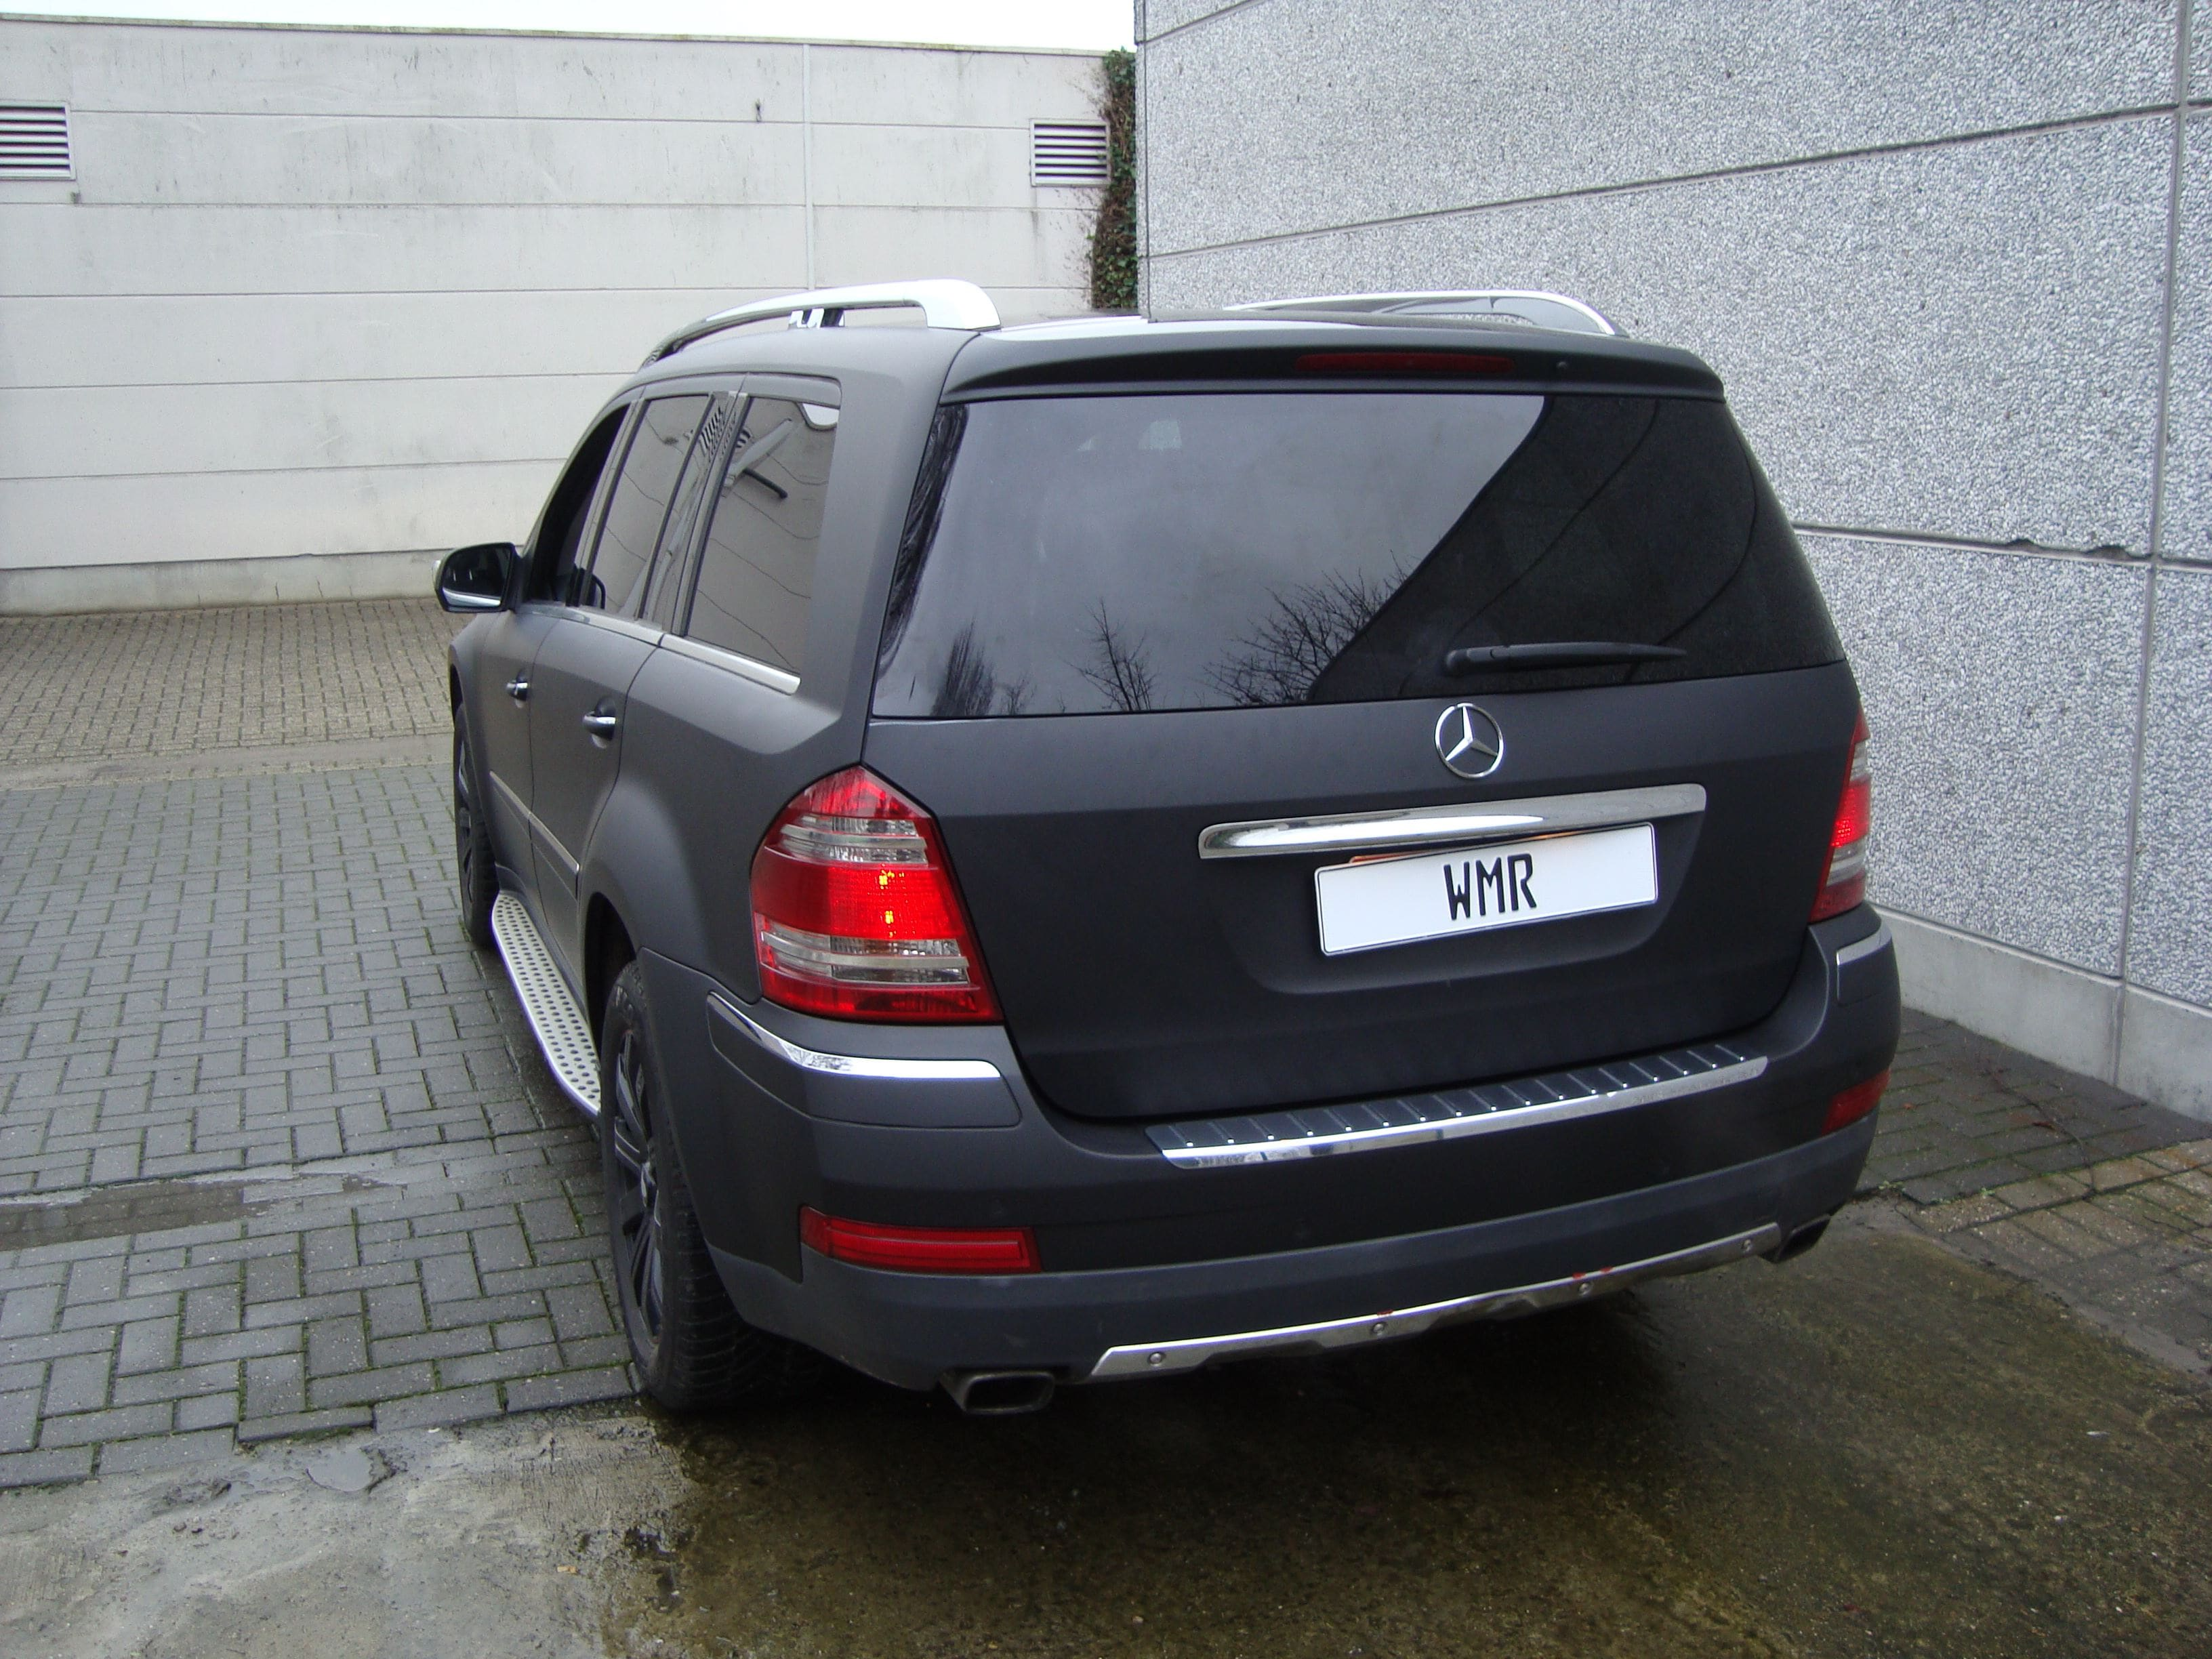 Mercedes GL met Mat Zwarte Wrap, Carwrapping door Wrapmyride.nu Foto-nr:6288, ©2020